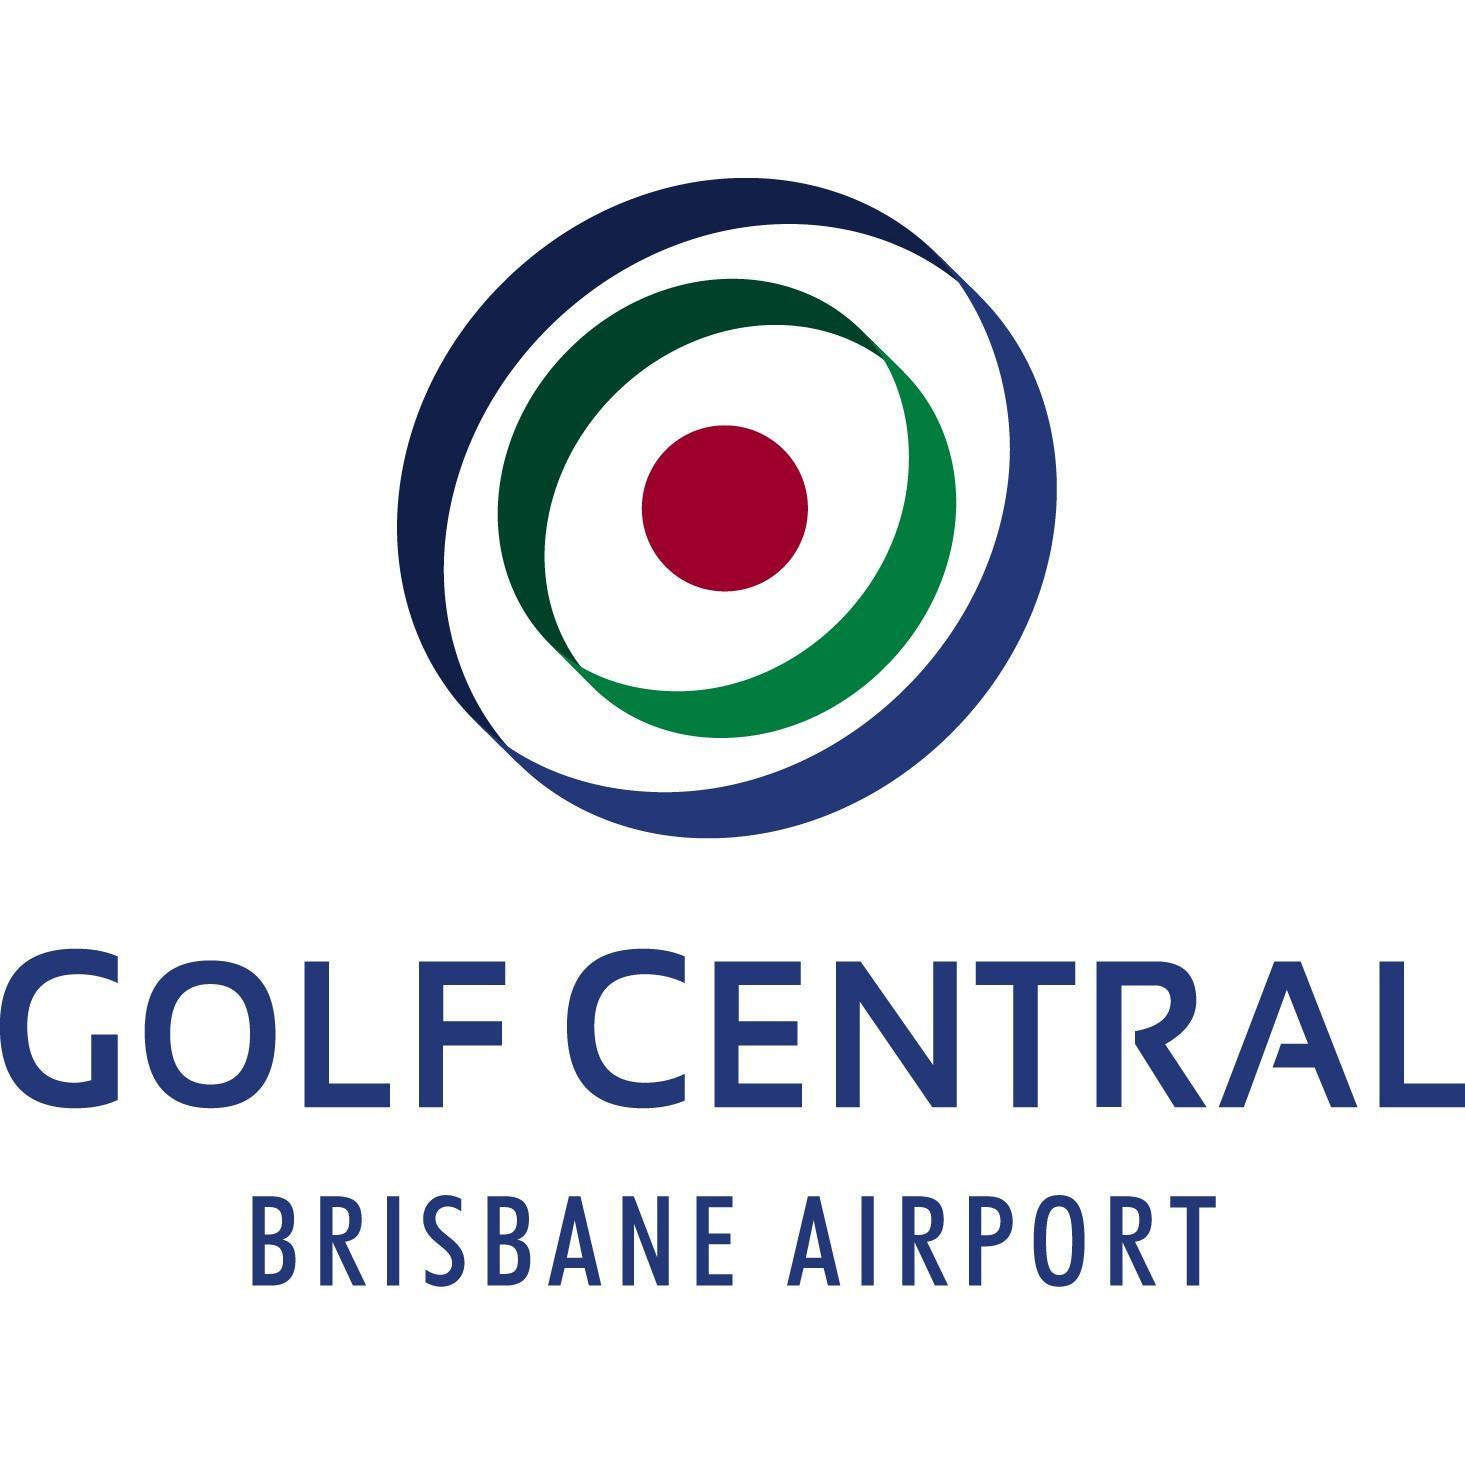 Golf Central BNE - Brisbane Airport, QLD 4010 - (07) 3087 7800 | ShowMeLocal.com